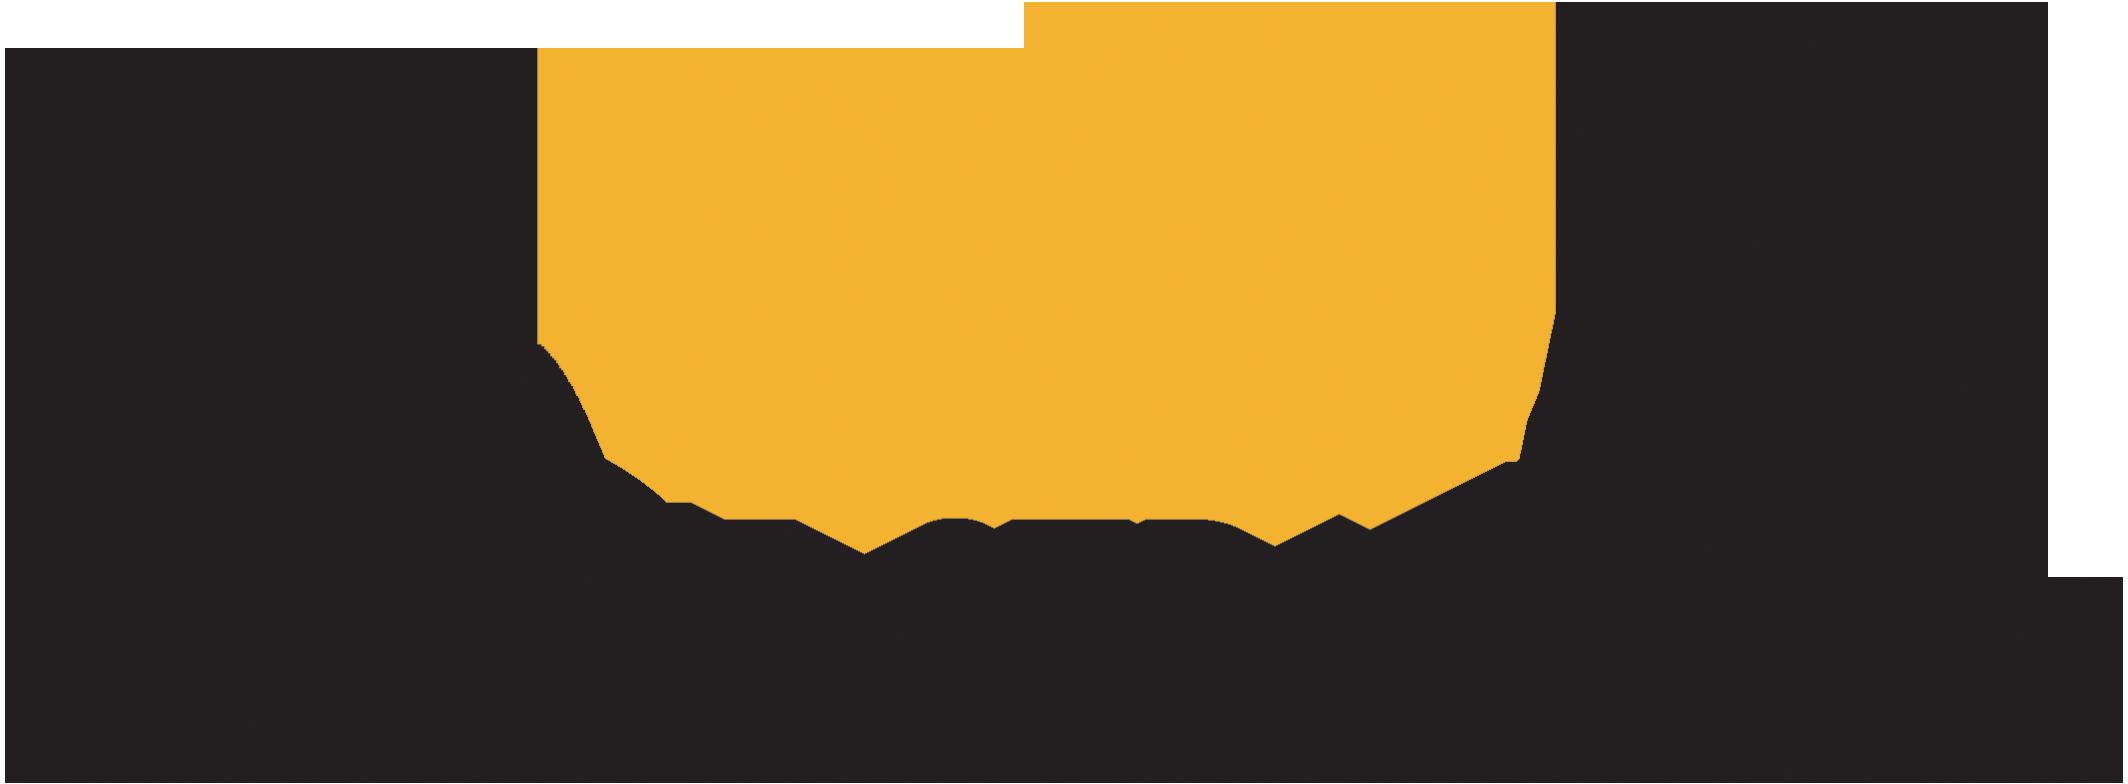 Espace Stratégie